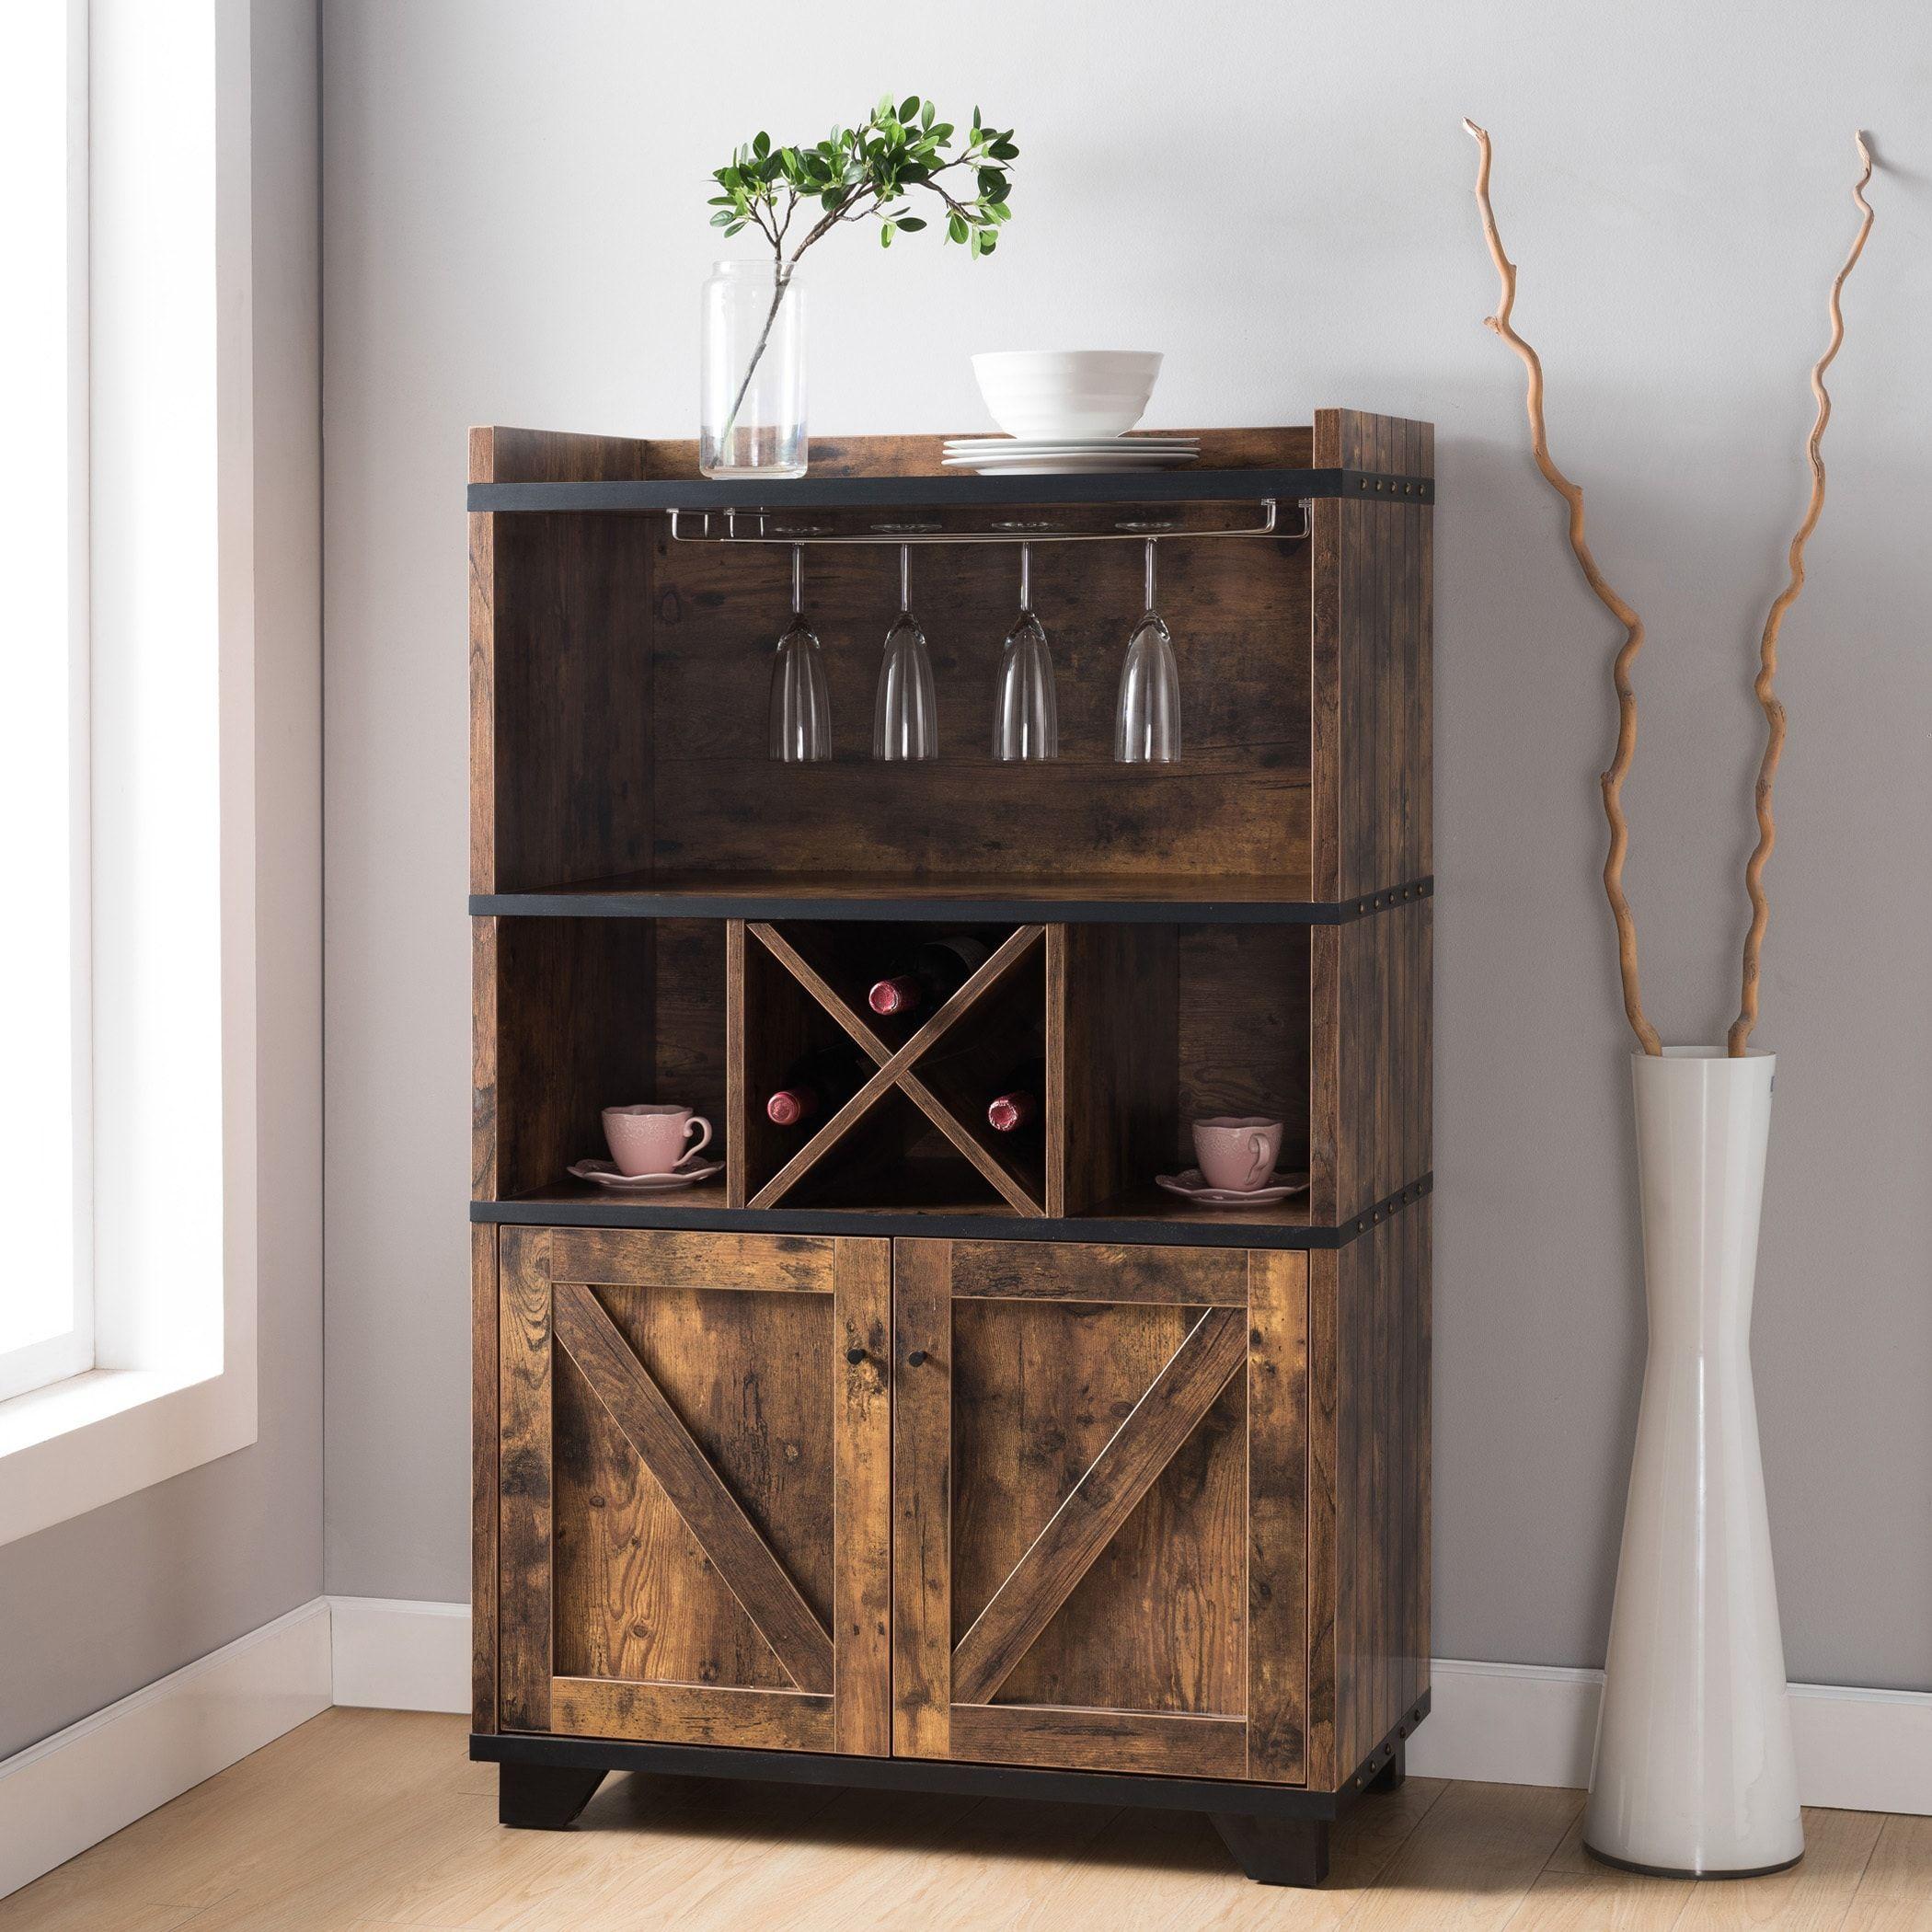 Terrific Furniture Of America Wesleyan Rustic Farmhouse Wine Cabinet Home Interior And Landscaping Transignezvosmurscom